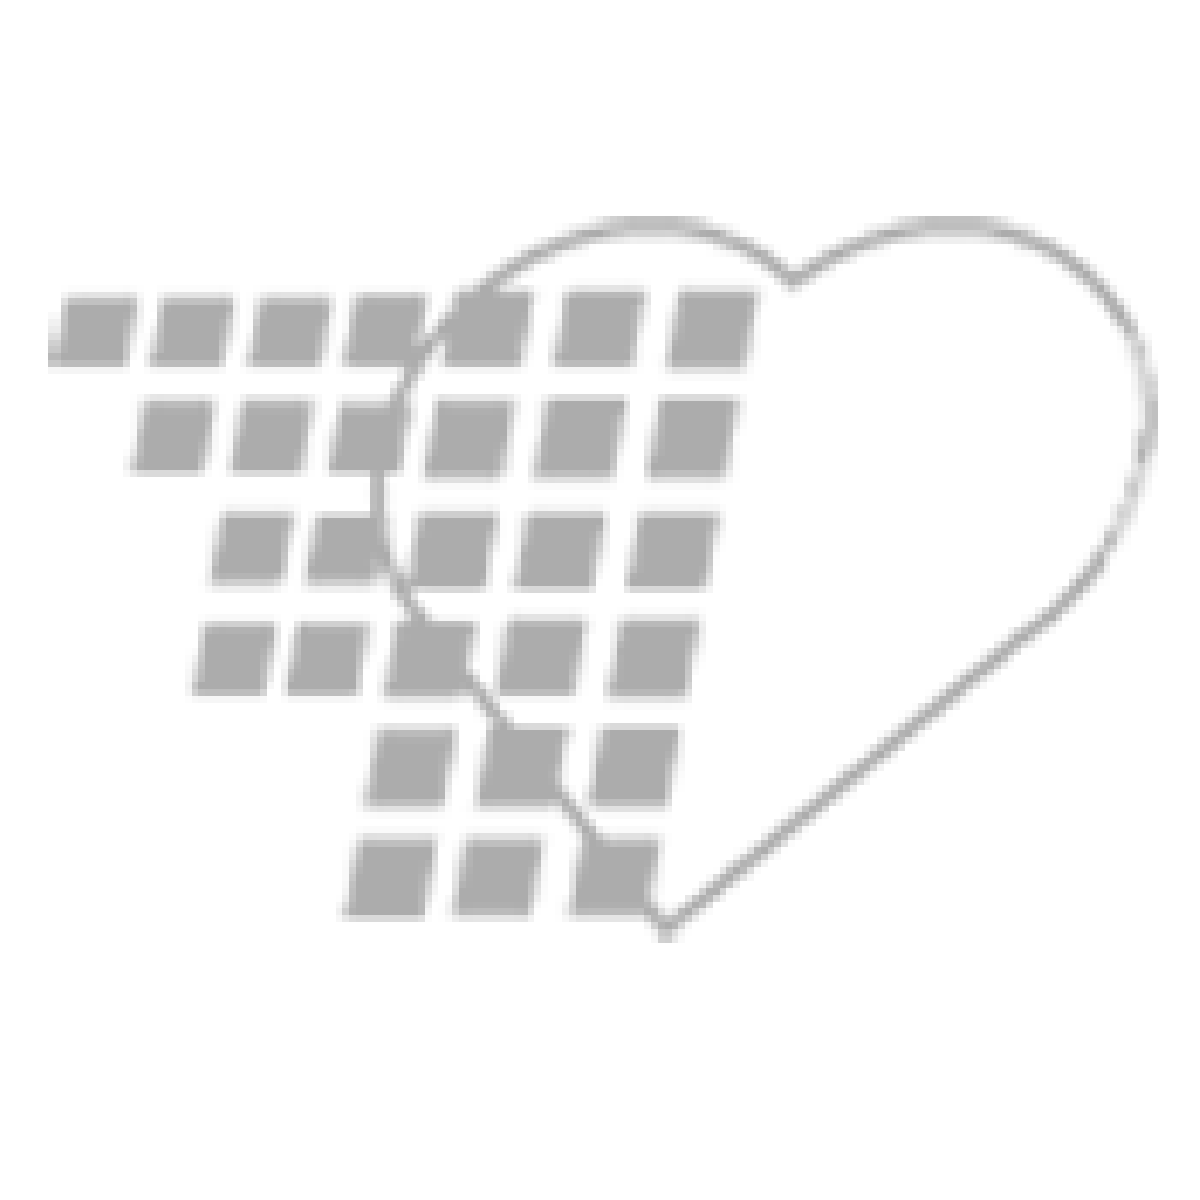 07-71-4605 Pocket Nurse® Tracheostomy Care Kit with Saline and Peroxide Each Latex Free